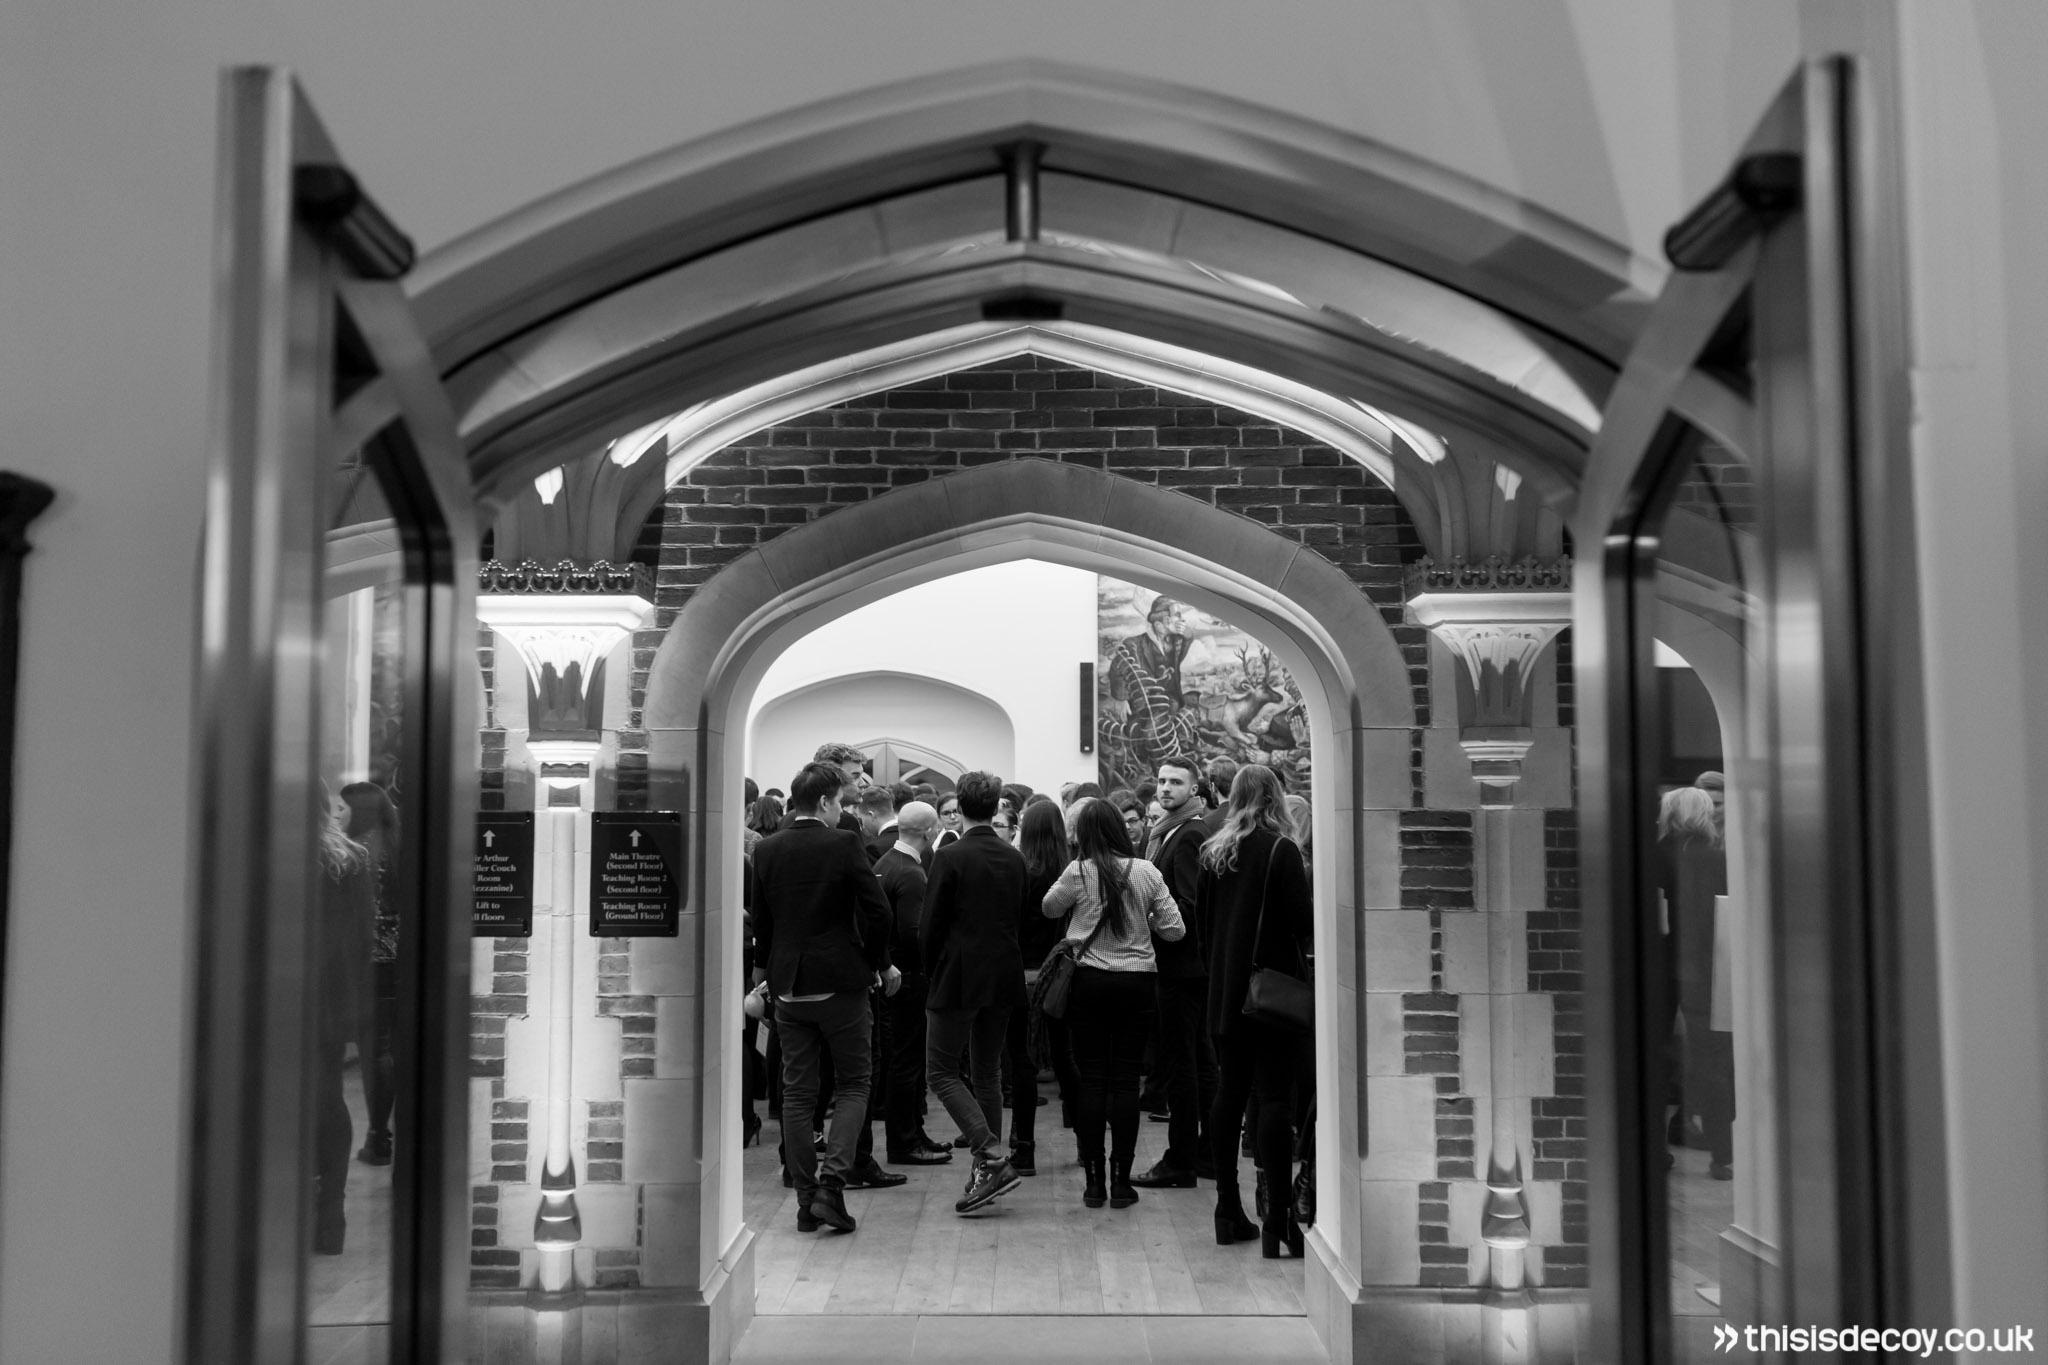 Polish Congress of Student Societies in the UK 2017 - Decoy Media - 12.jpg